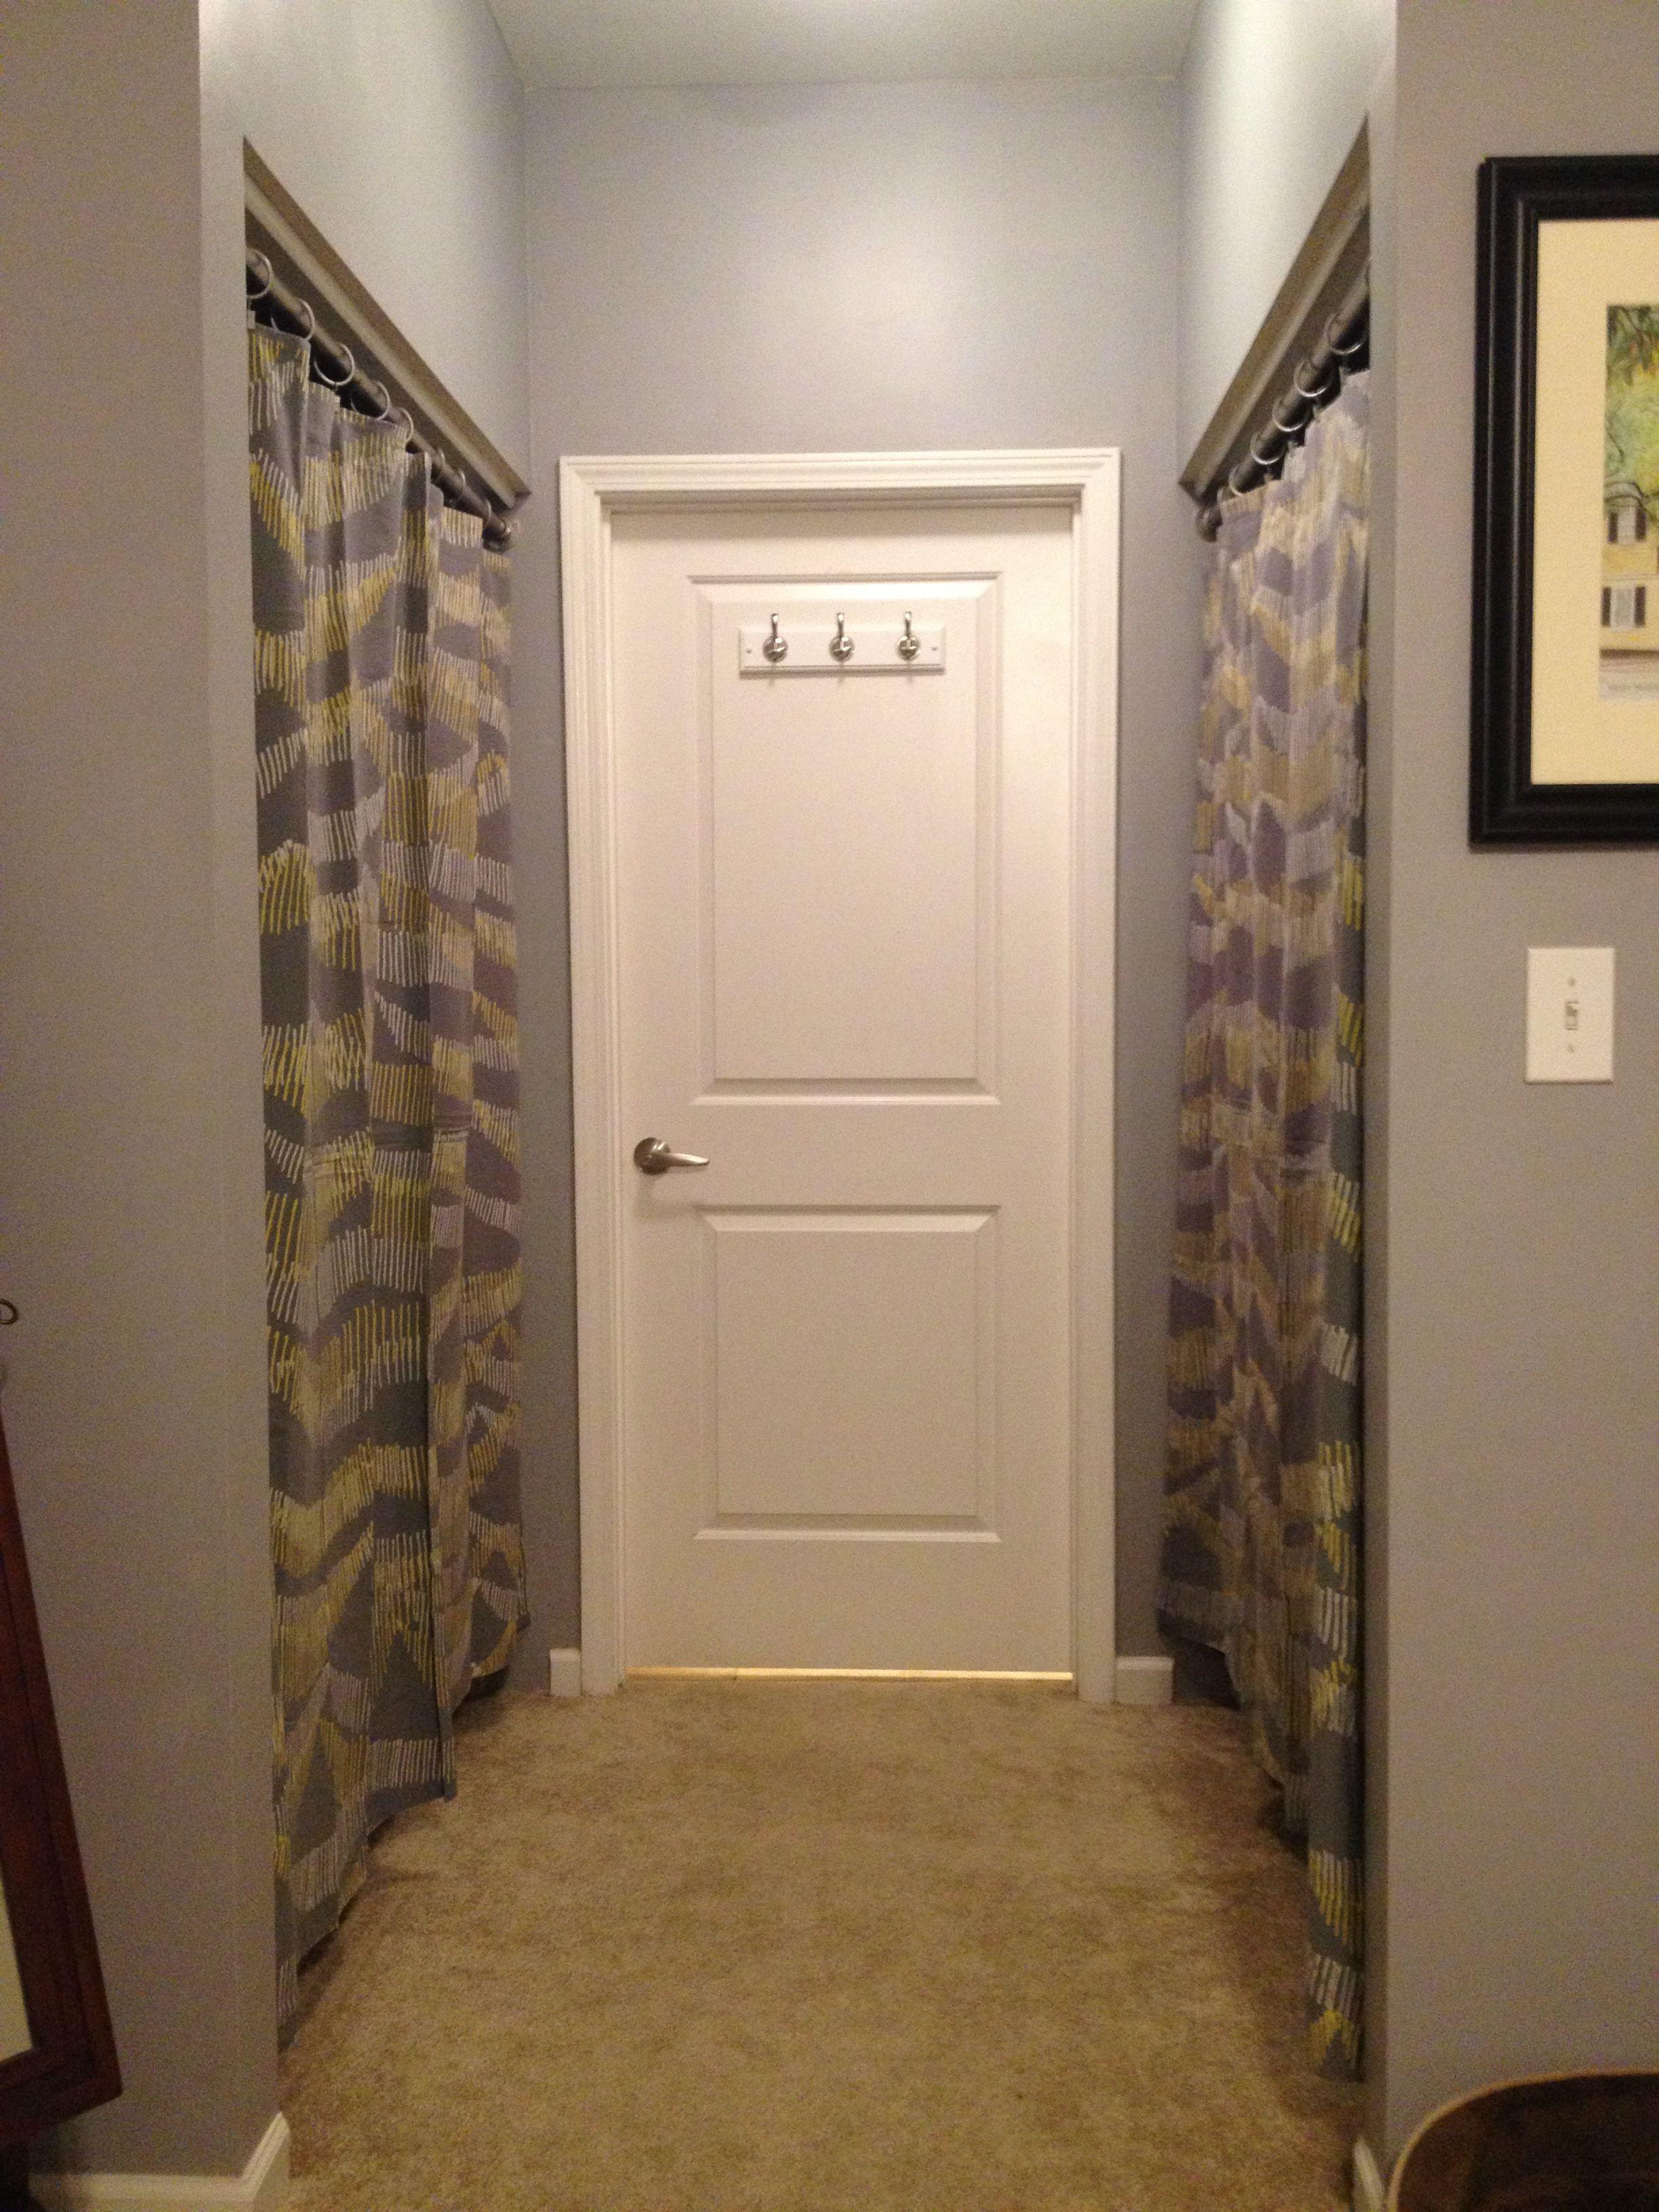 Wonderful Closet Door Ideas Curtain. Curtain Call! Closet Door Ideas